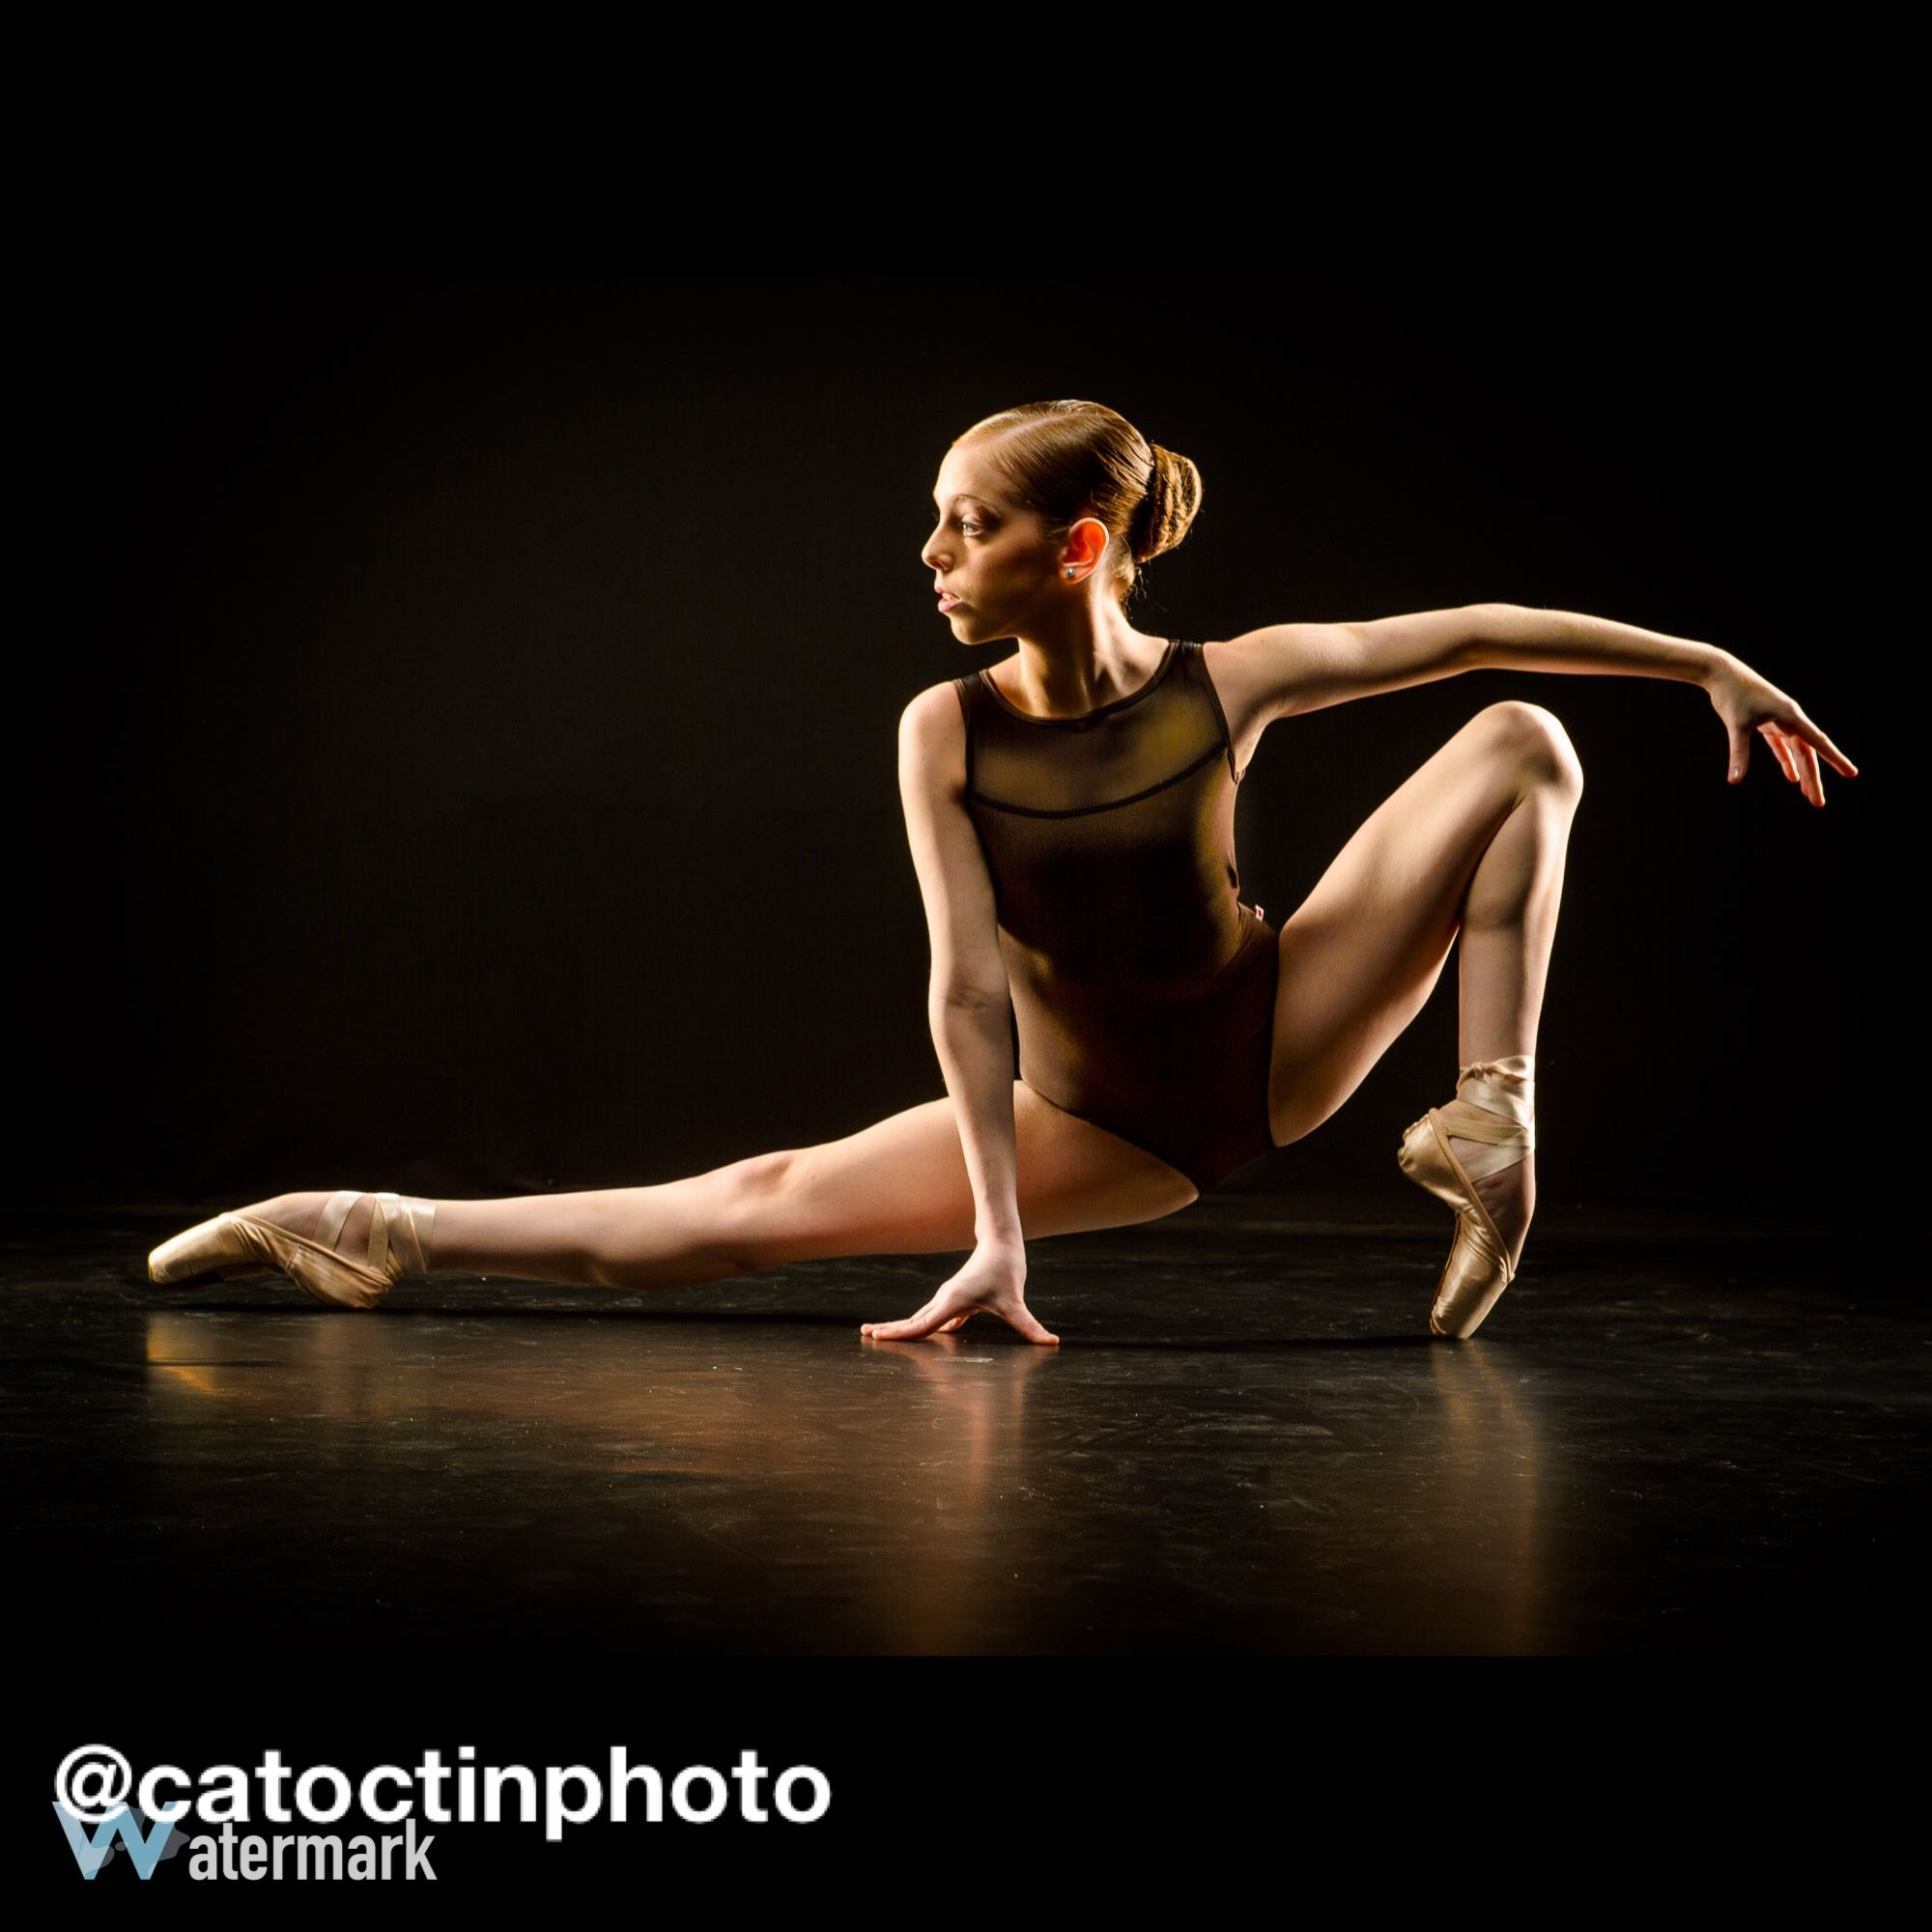 DancinPhotos: Christopher Peddecord #2